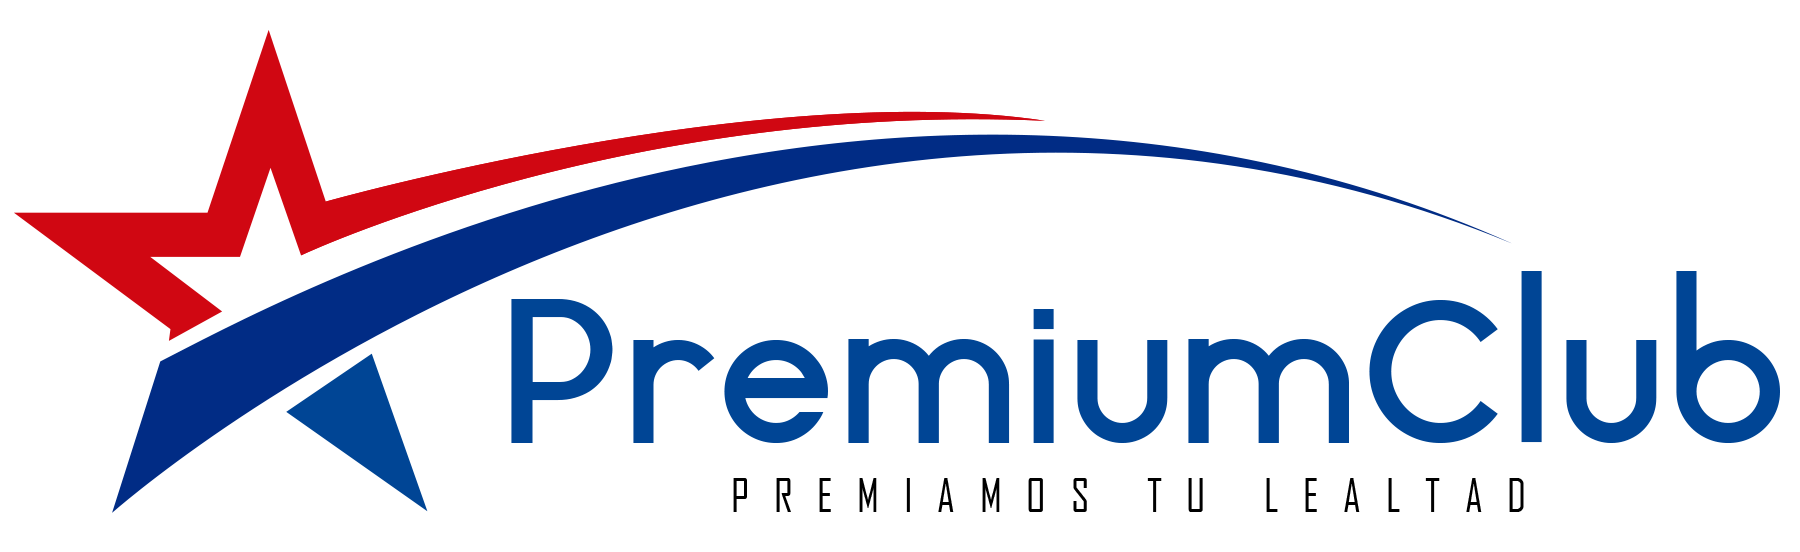 tarjeta-premium-club